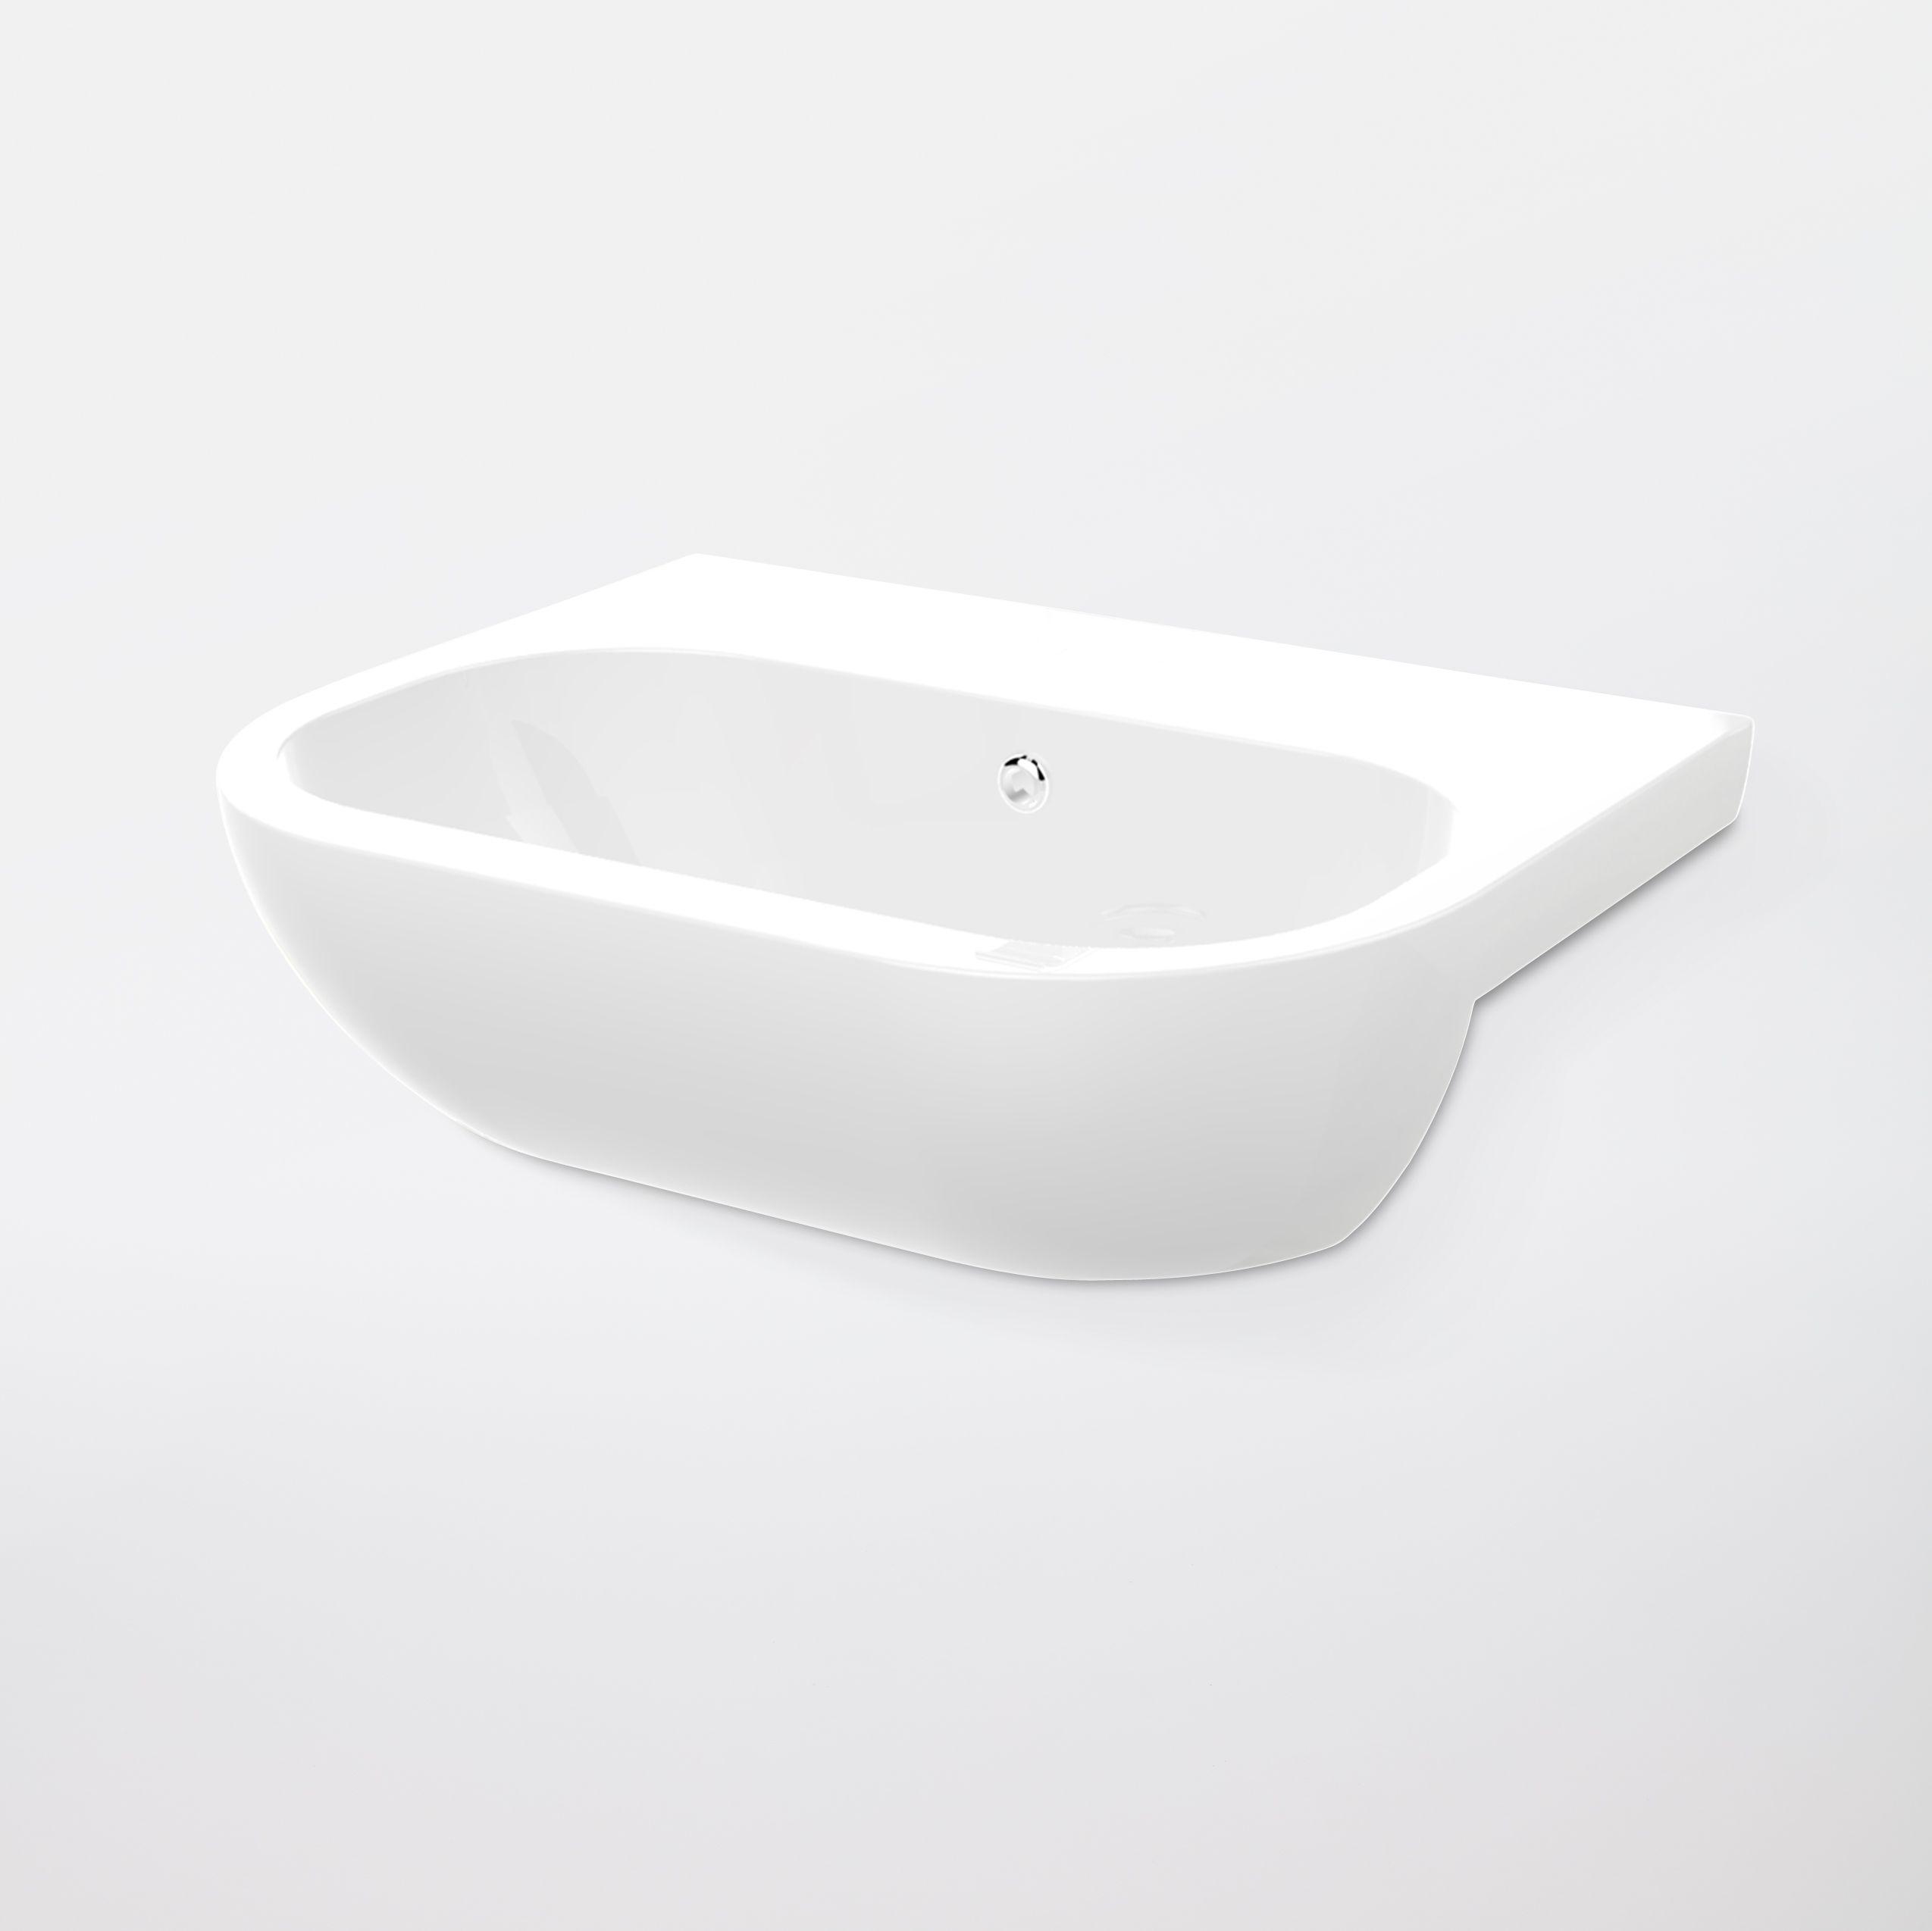 Bathroom Sinks B&Q Ireland cooke & lewis helena semi-recessed basin | departments | diy at b&q